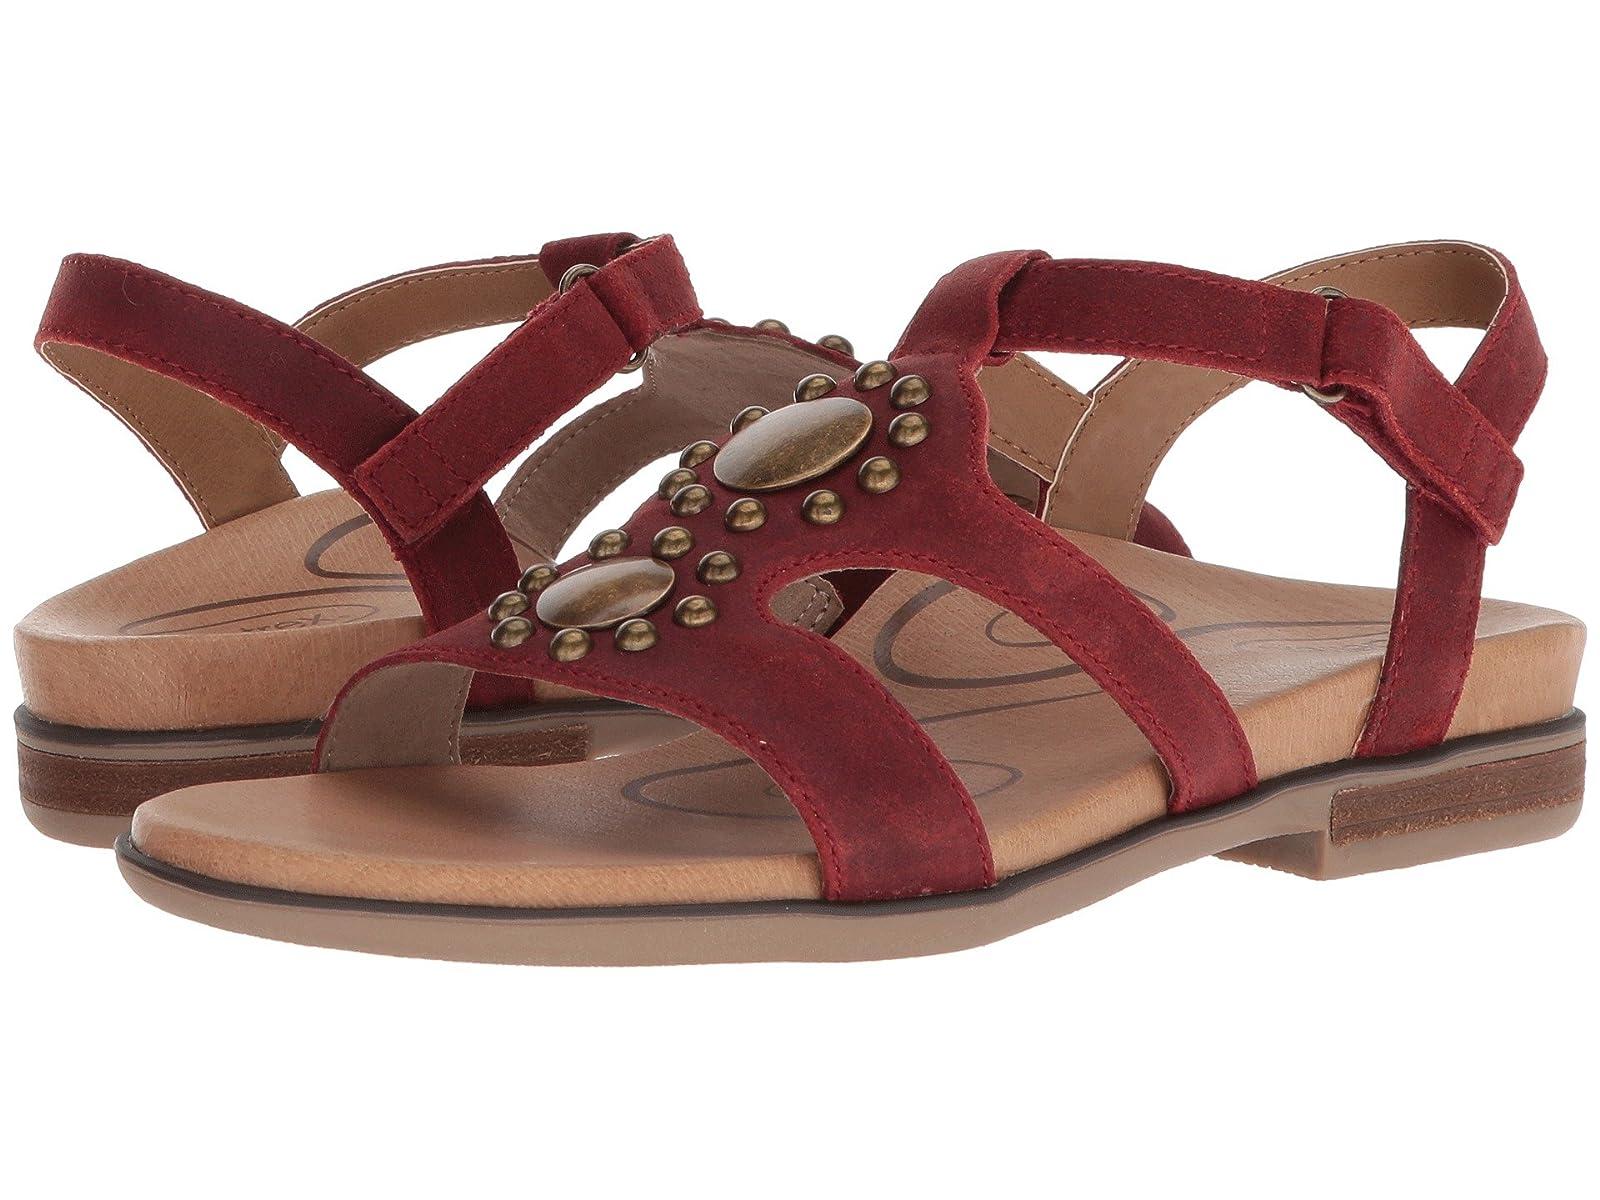 Aetrex VivianCheap and distinctive eye-catching shoes